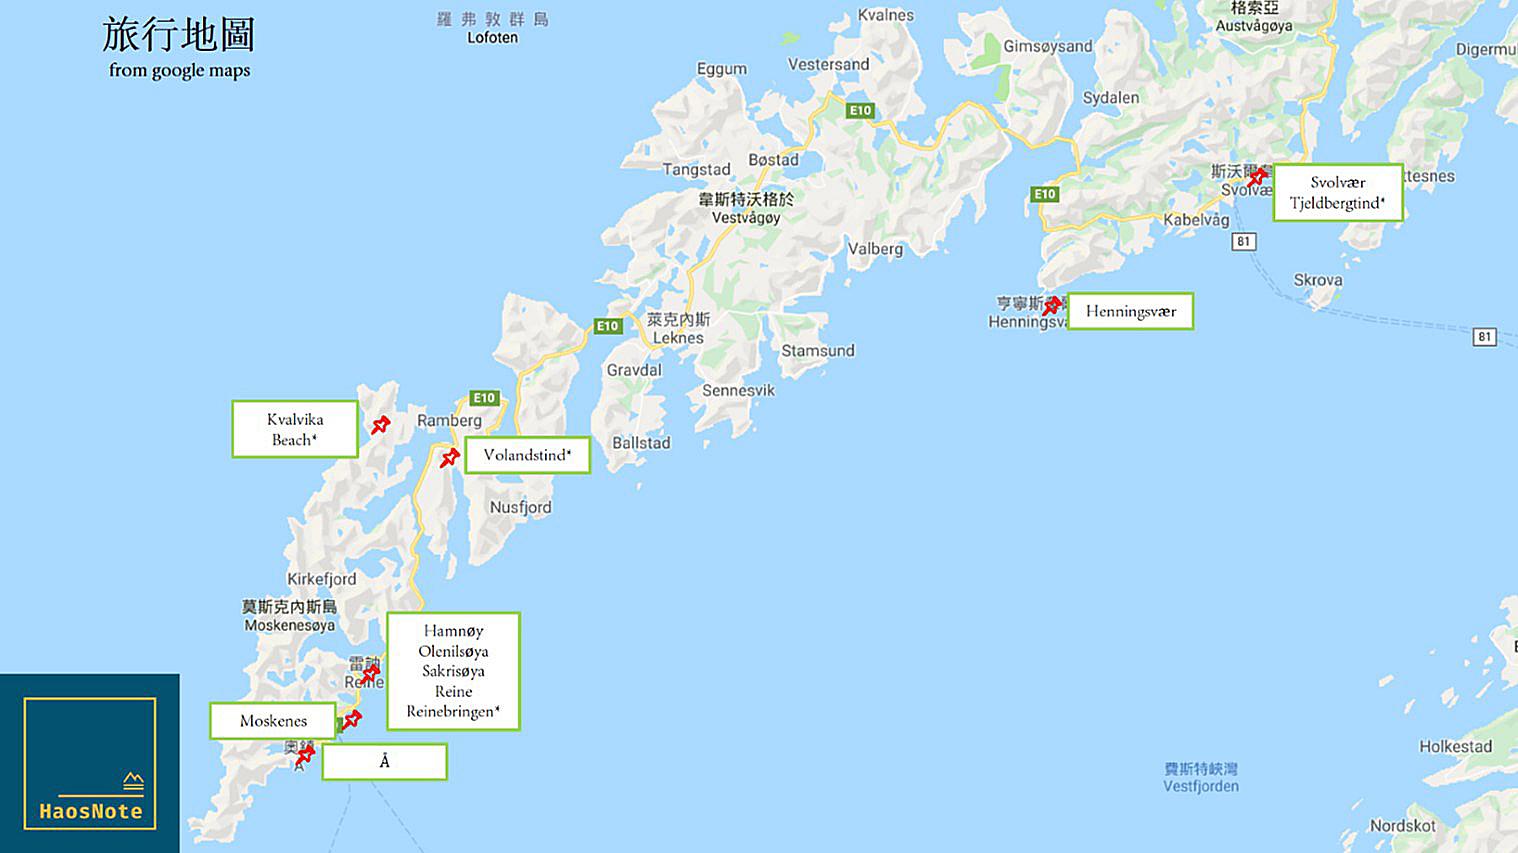 Hao的旅行筆記: 04.2019 挪威 羅浮敦群島的行程花費與衣食住行